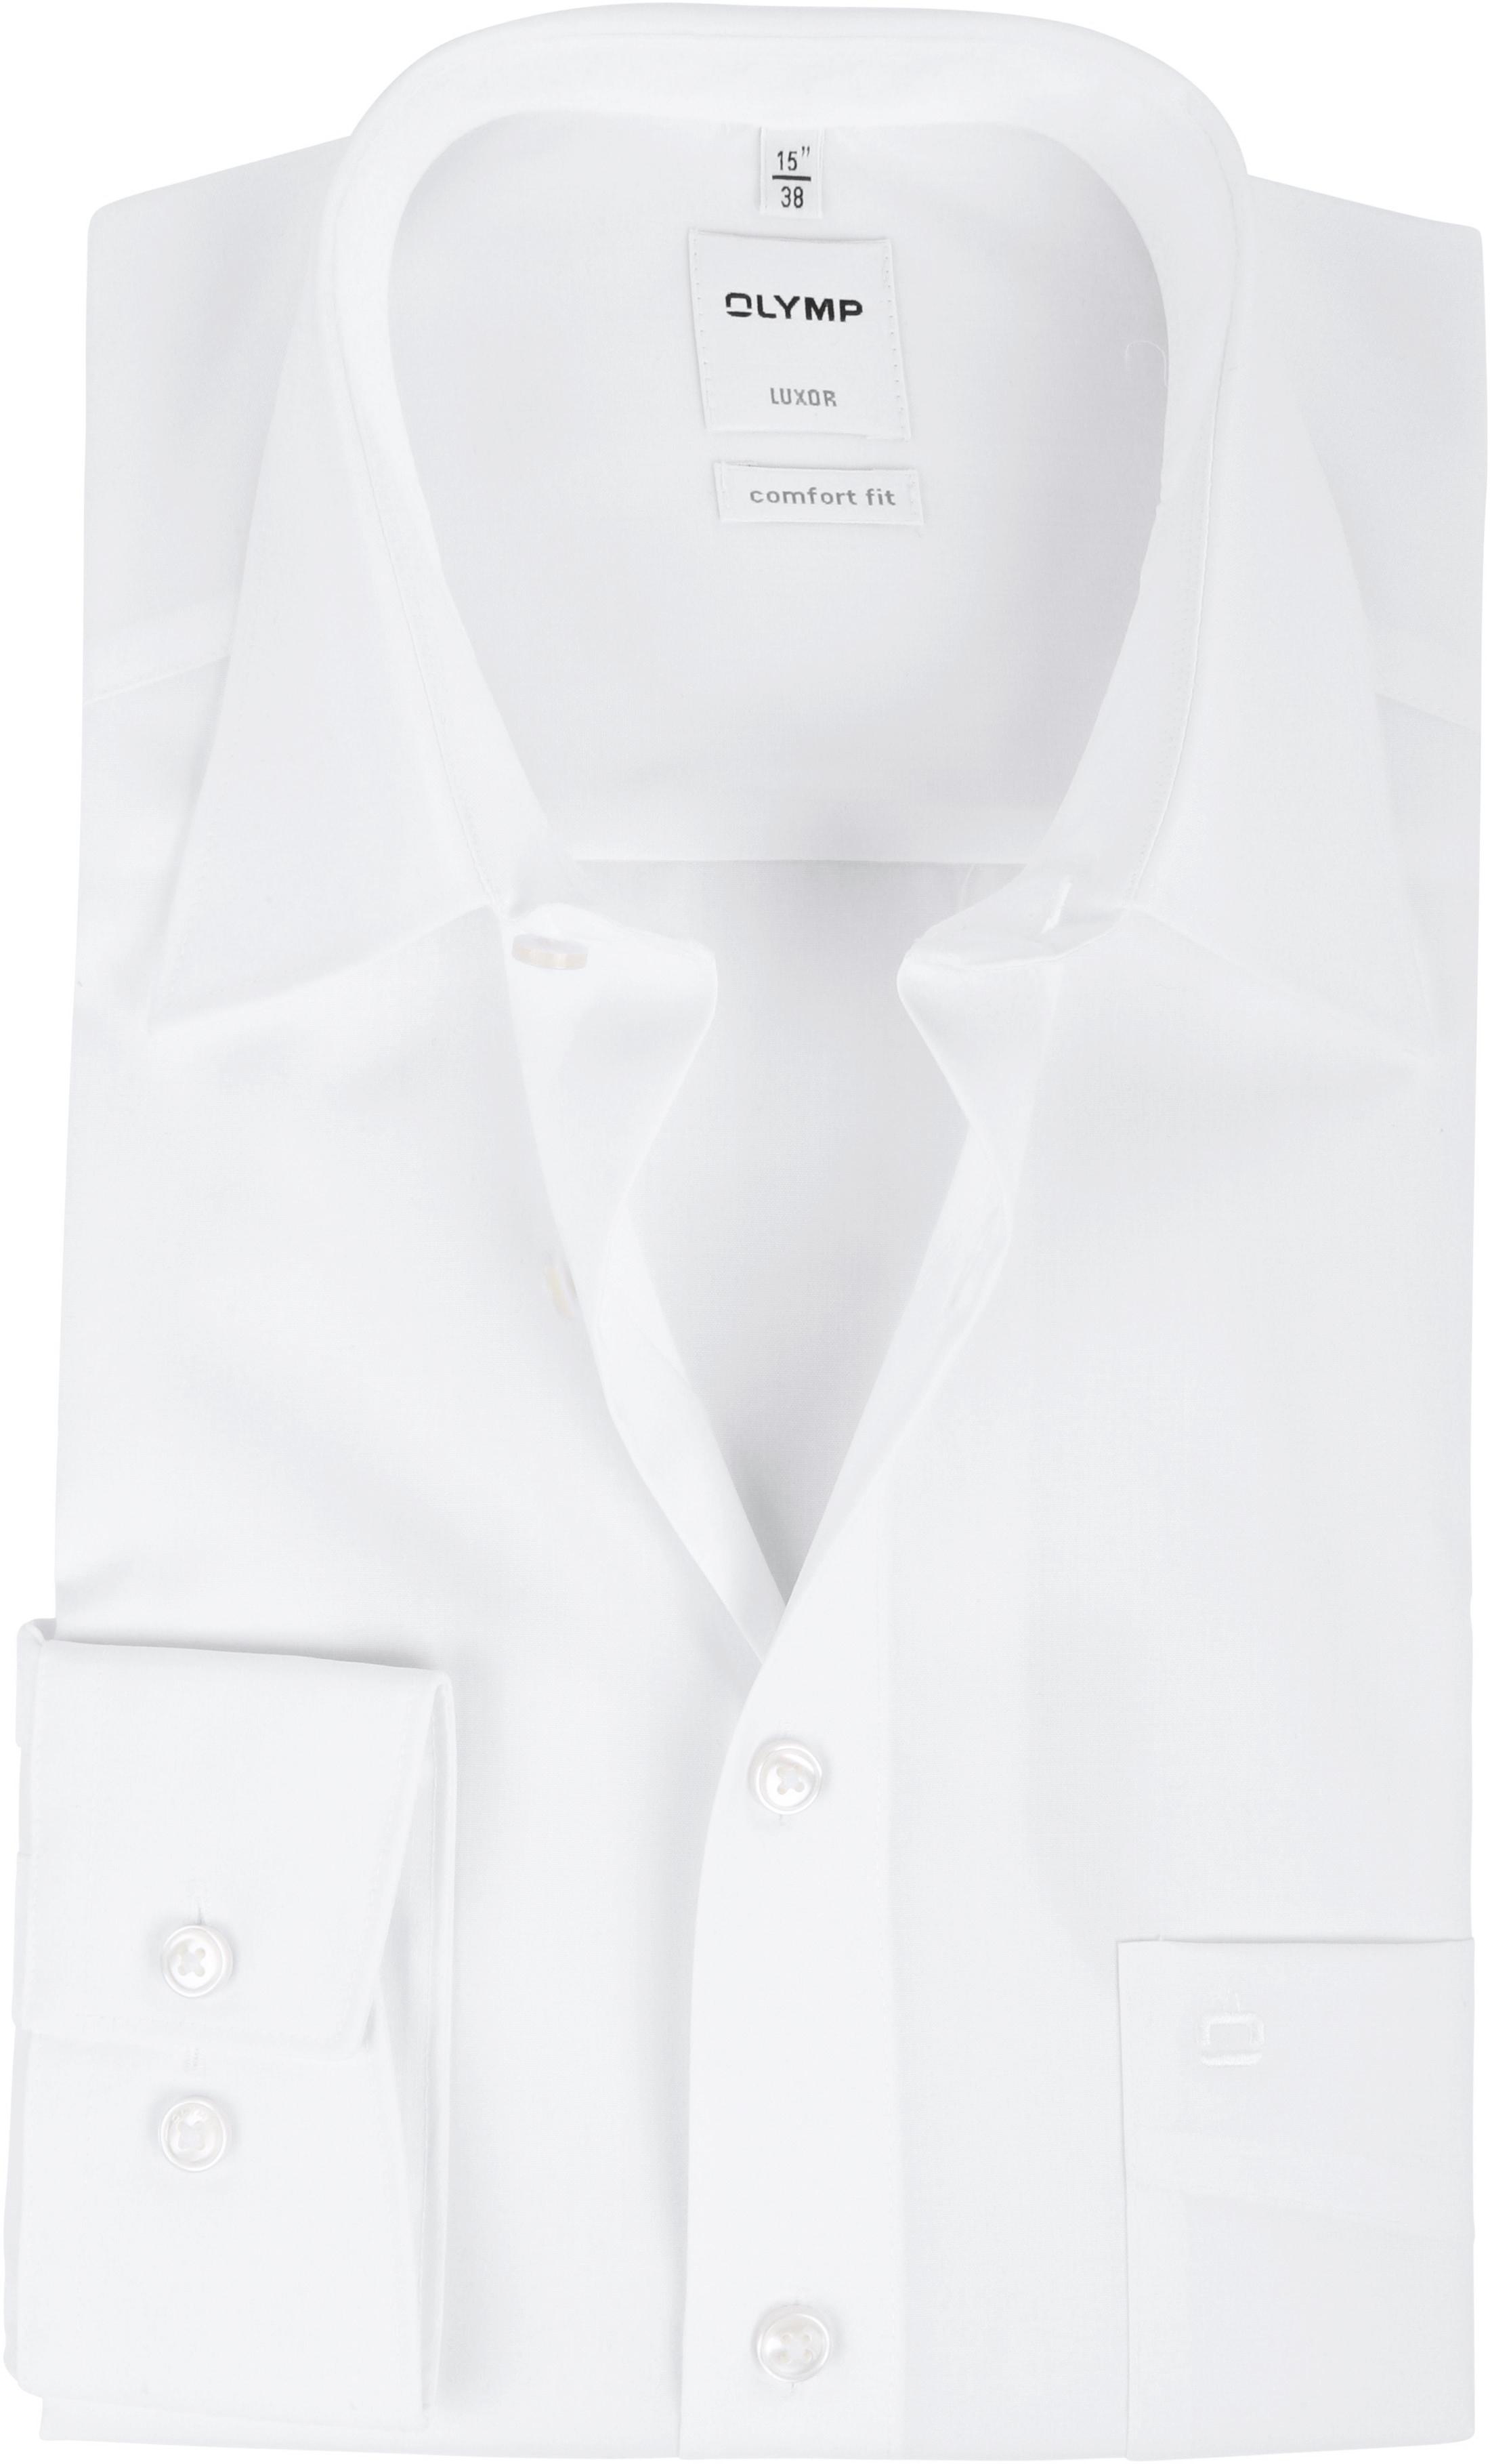 OLYMP Luxor Comfort Fit Overhemd Wit foto 0